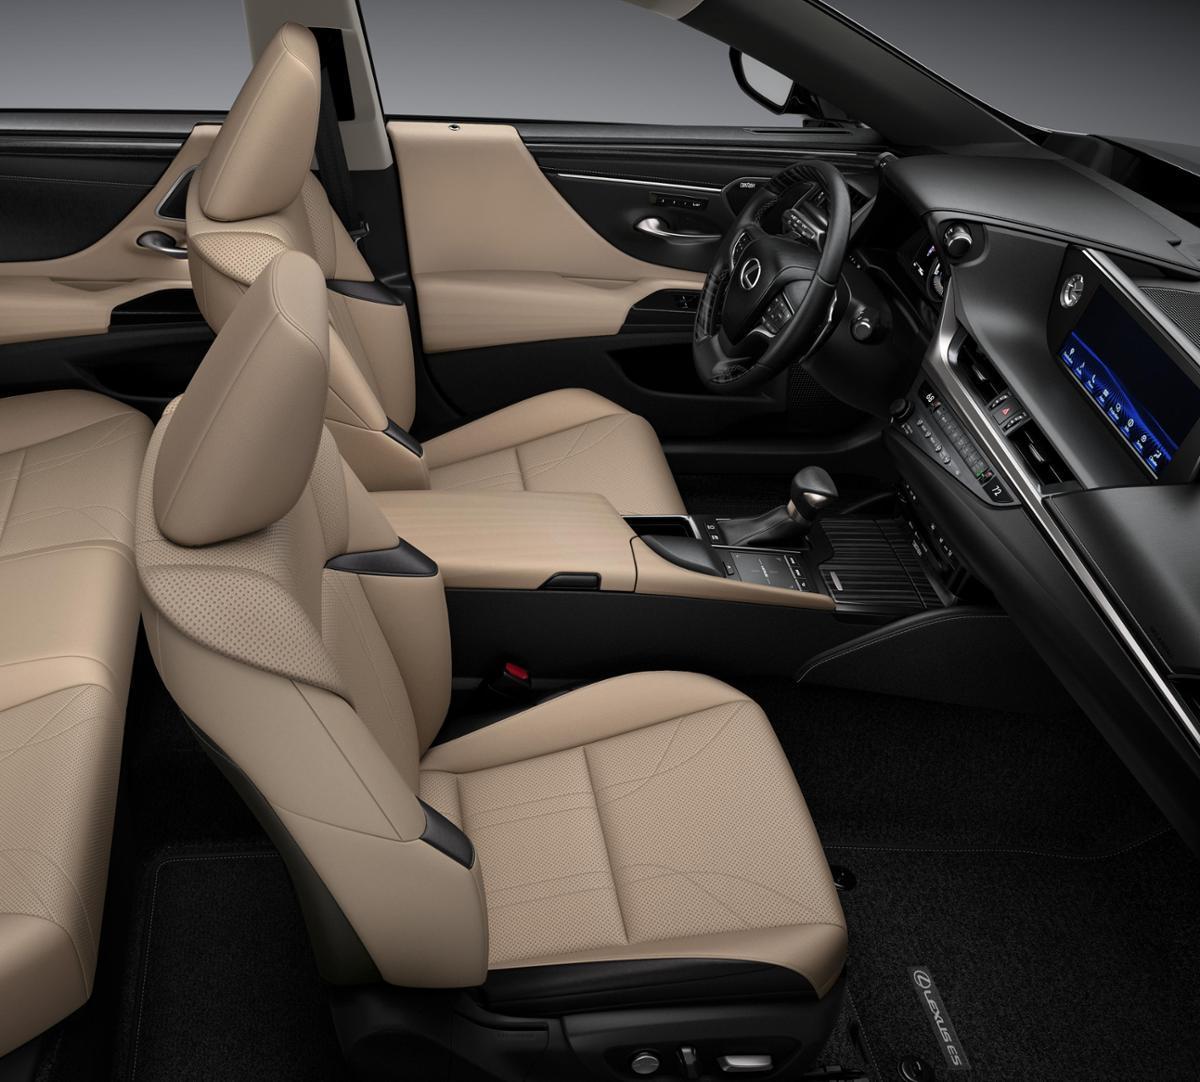 2019 Lexus ES 300h For Sale In San Jose